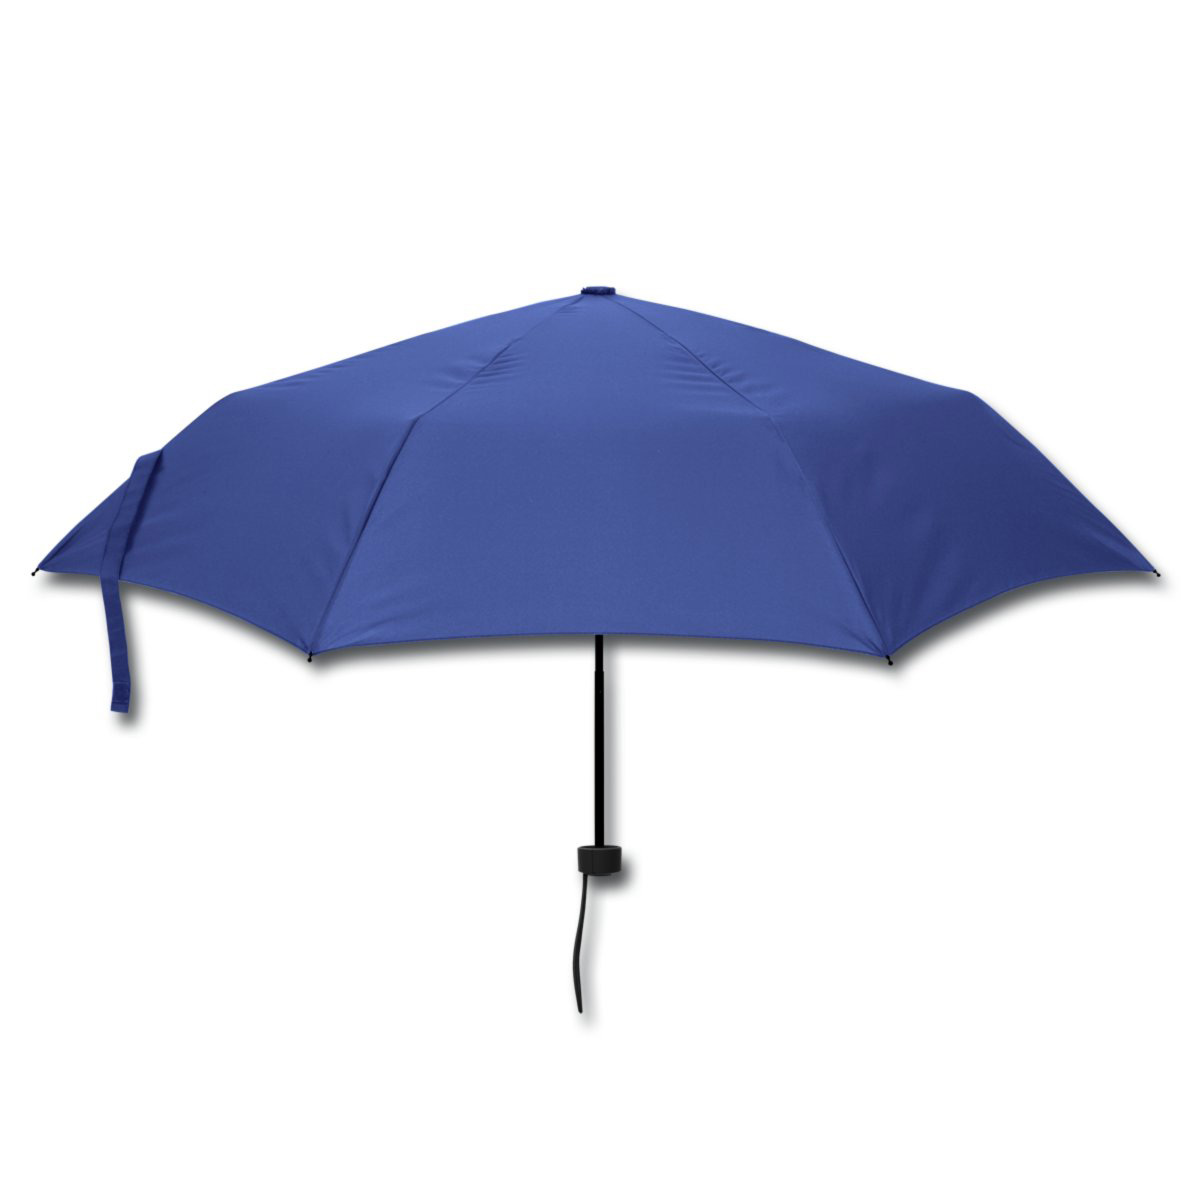 taschen regenschirm selbst gestalten kleiner regenschirm. Black Bedroom Furniture Sets. Home Design Ideas